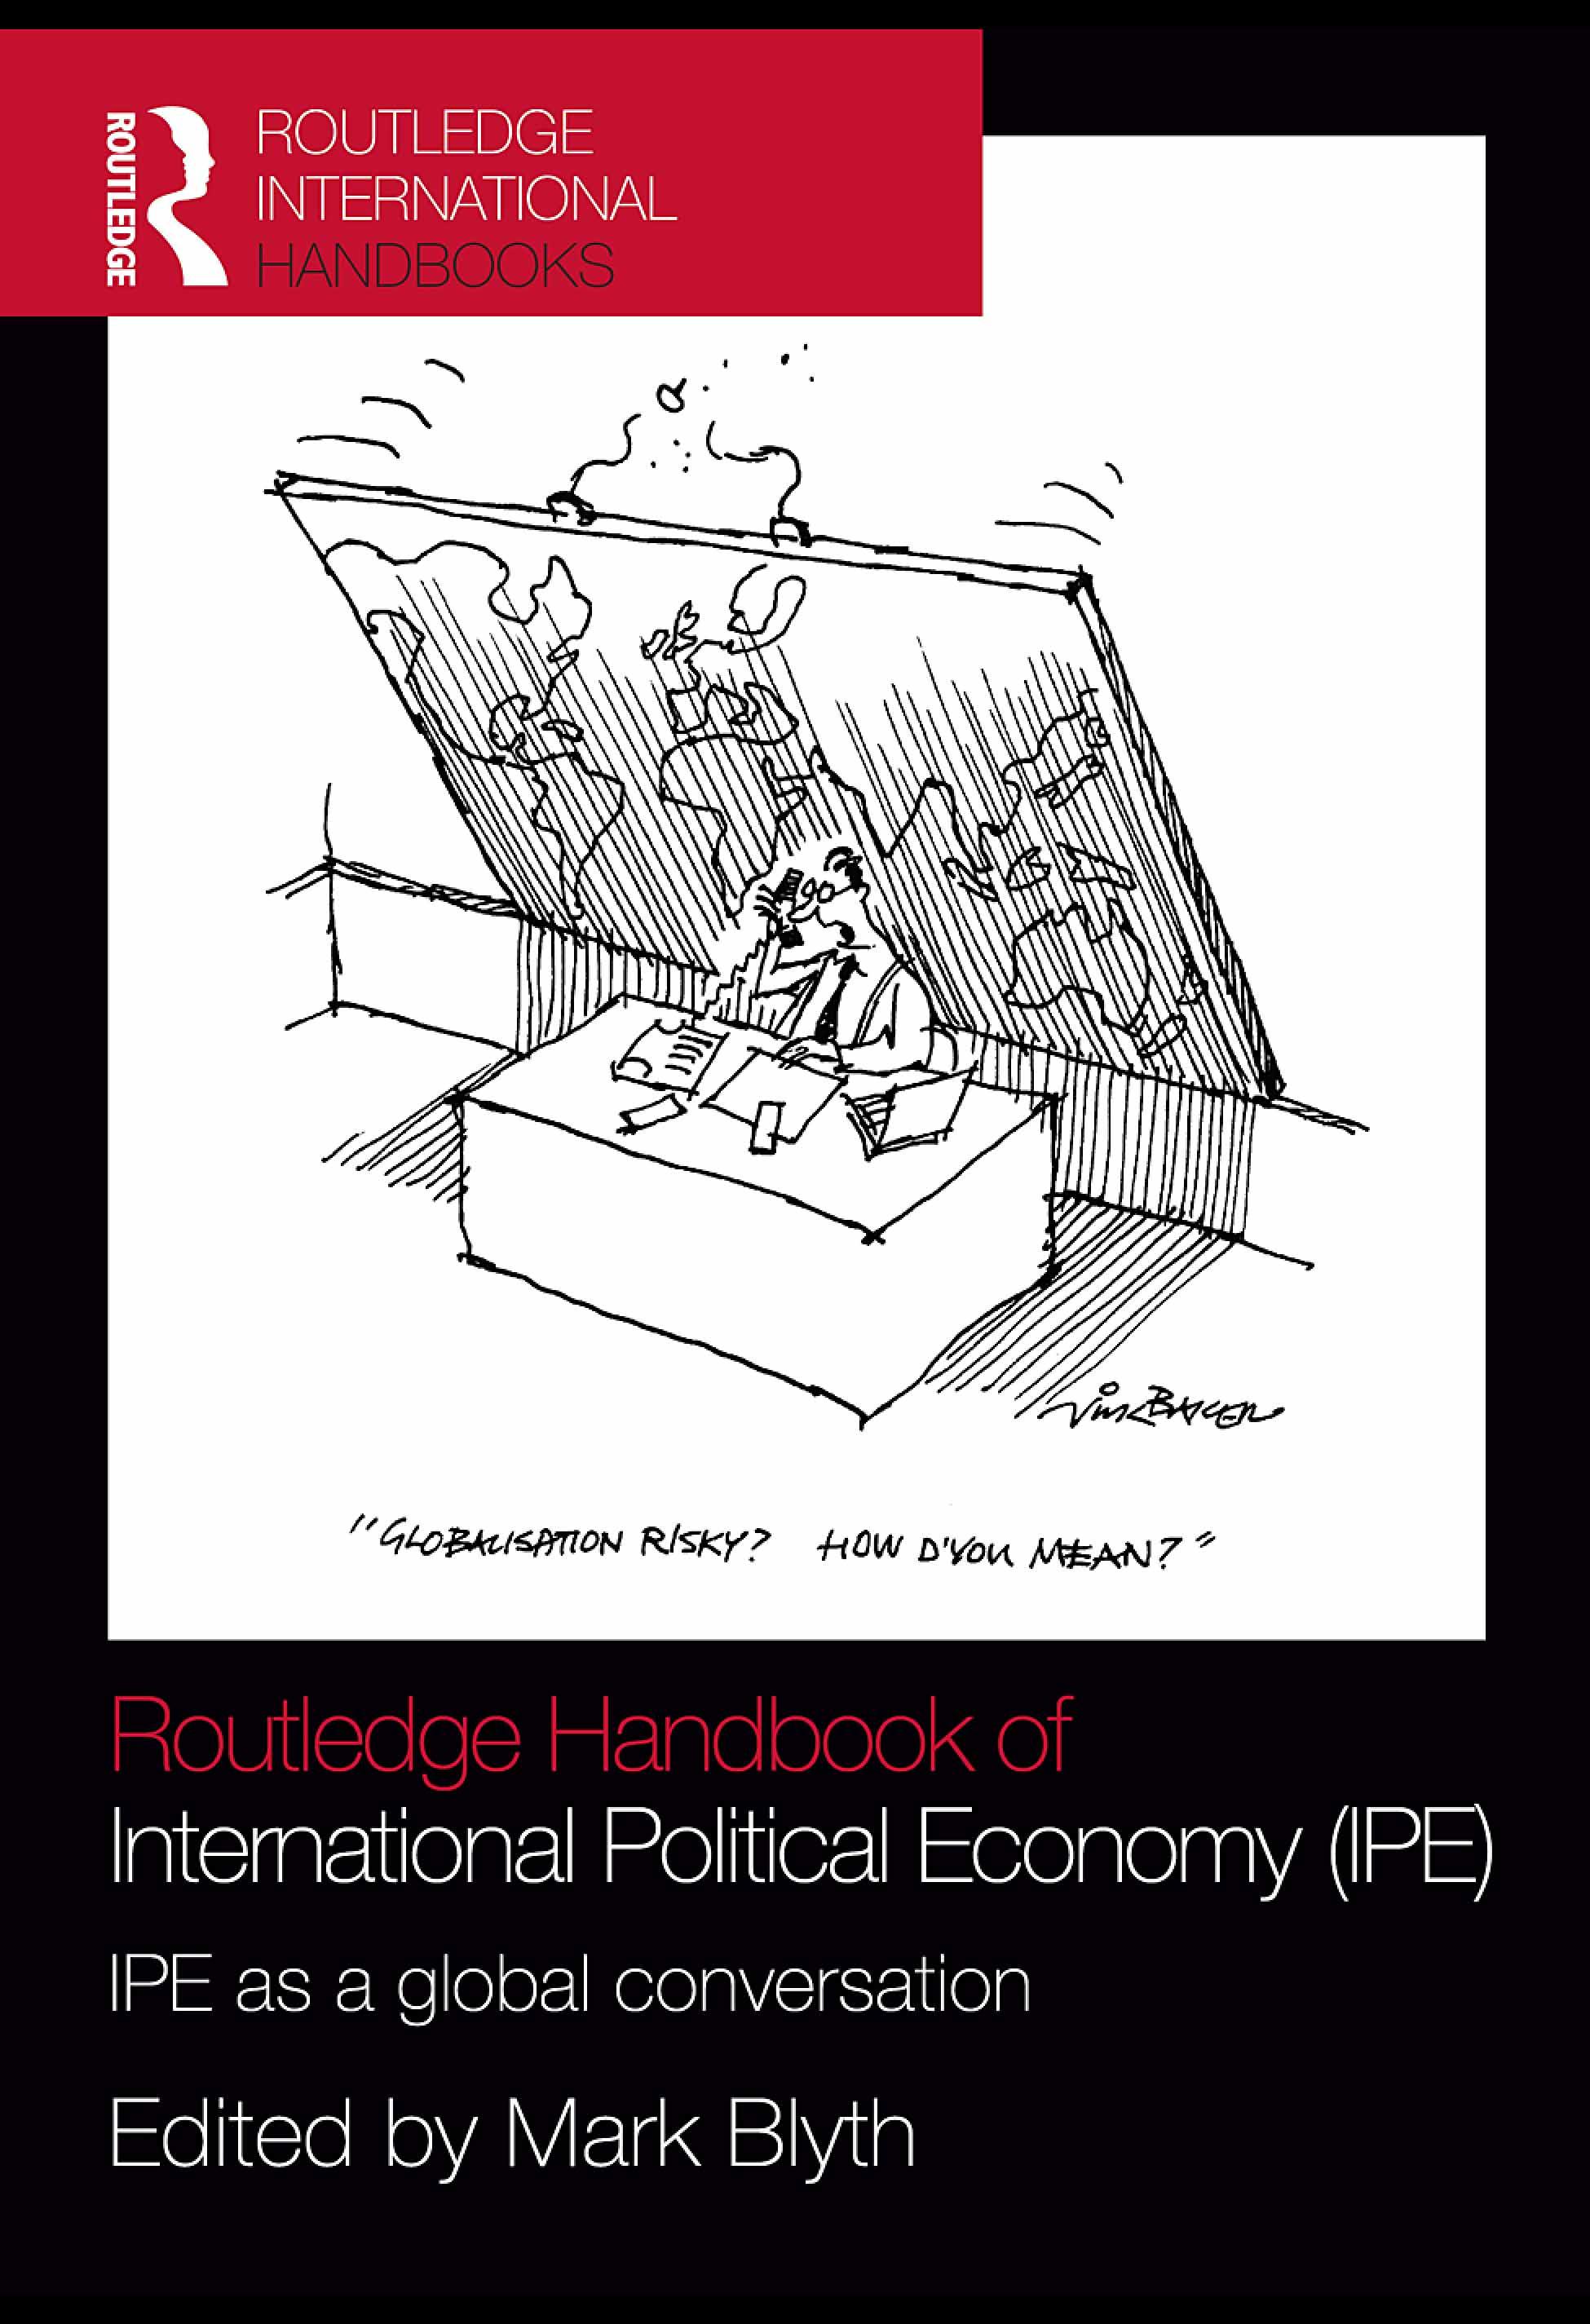 book cover_international political economy as a global conversation.jpg